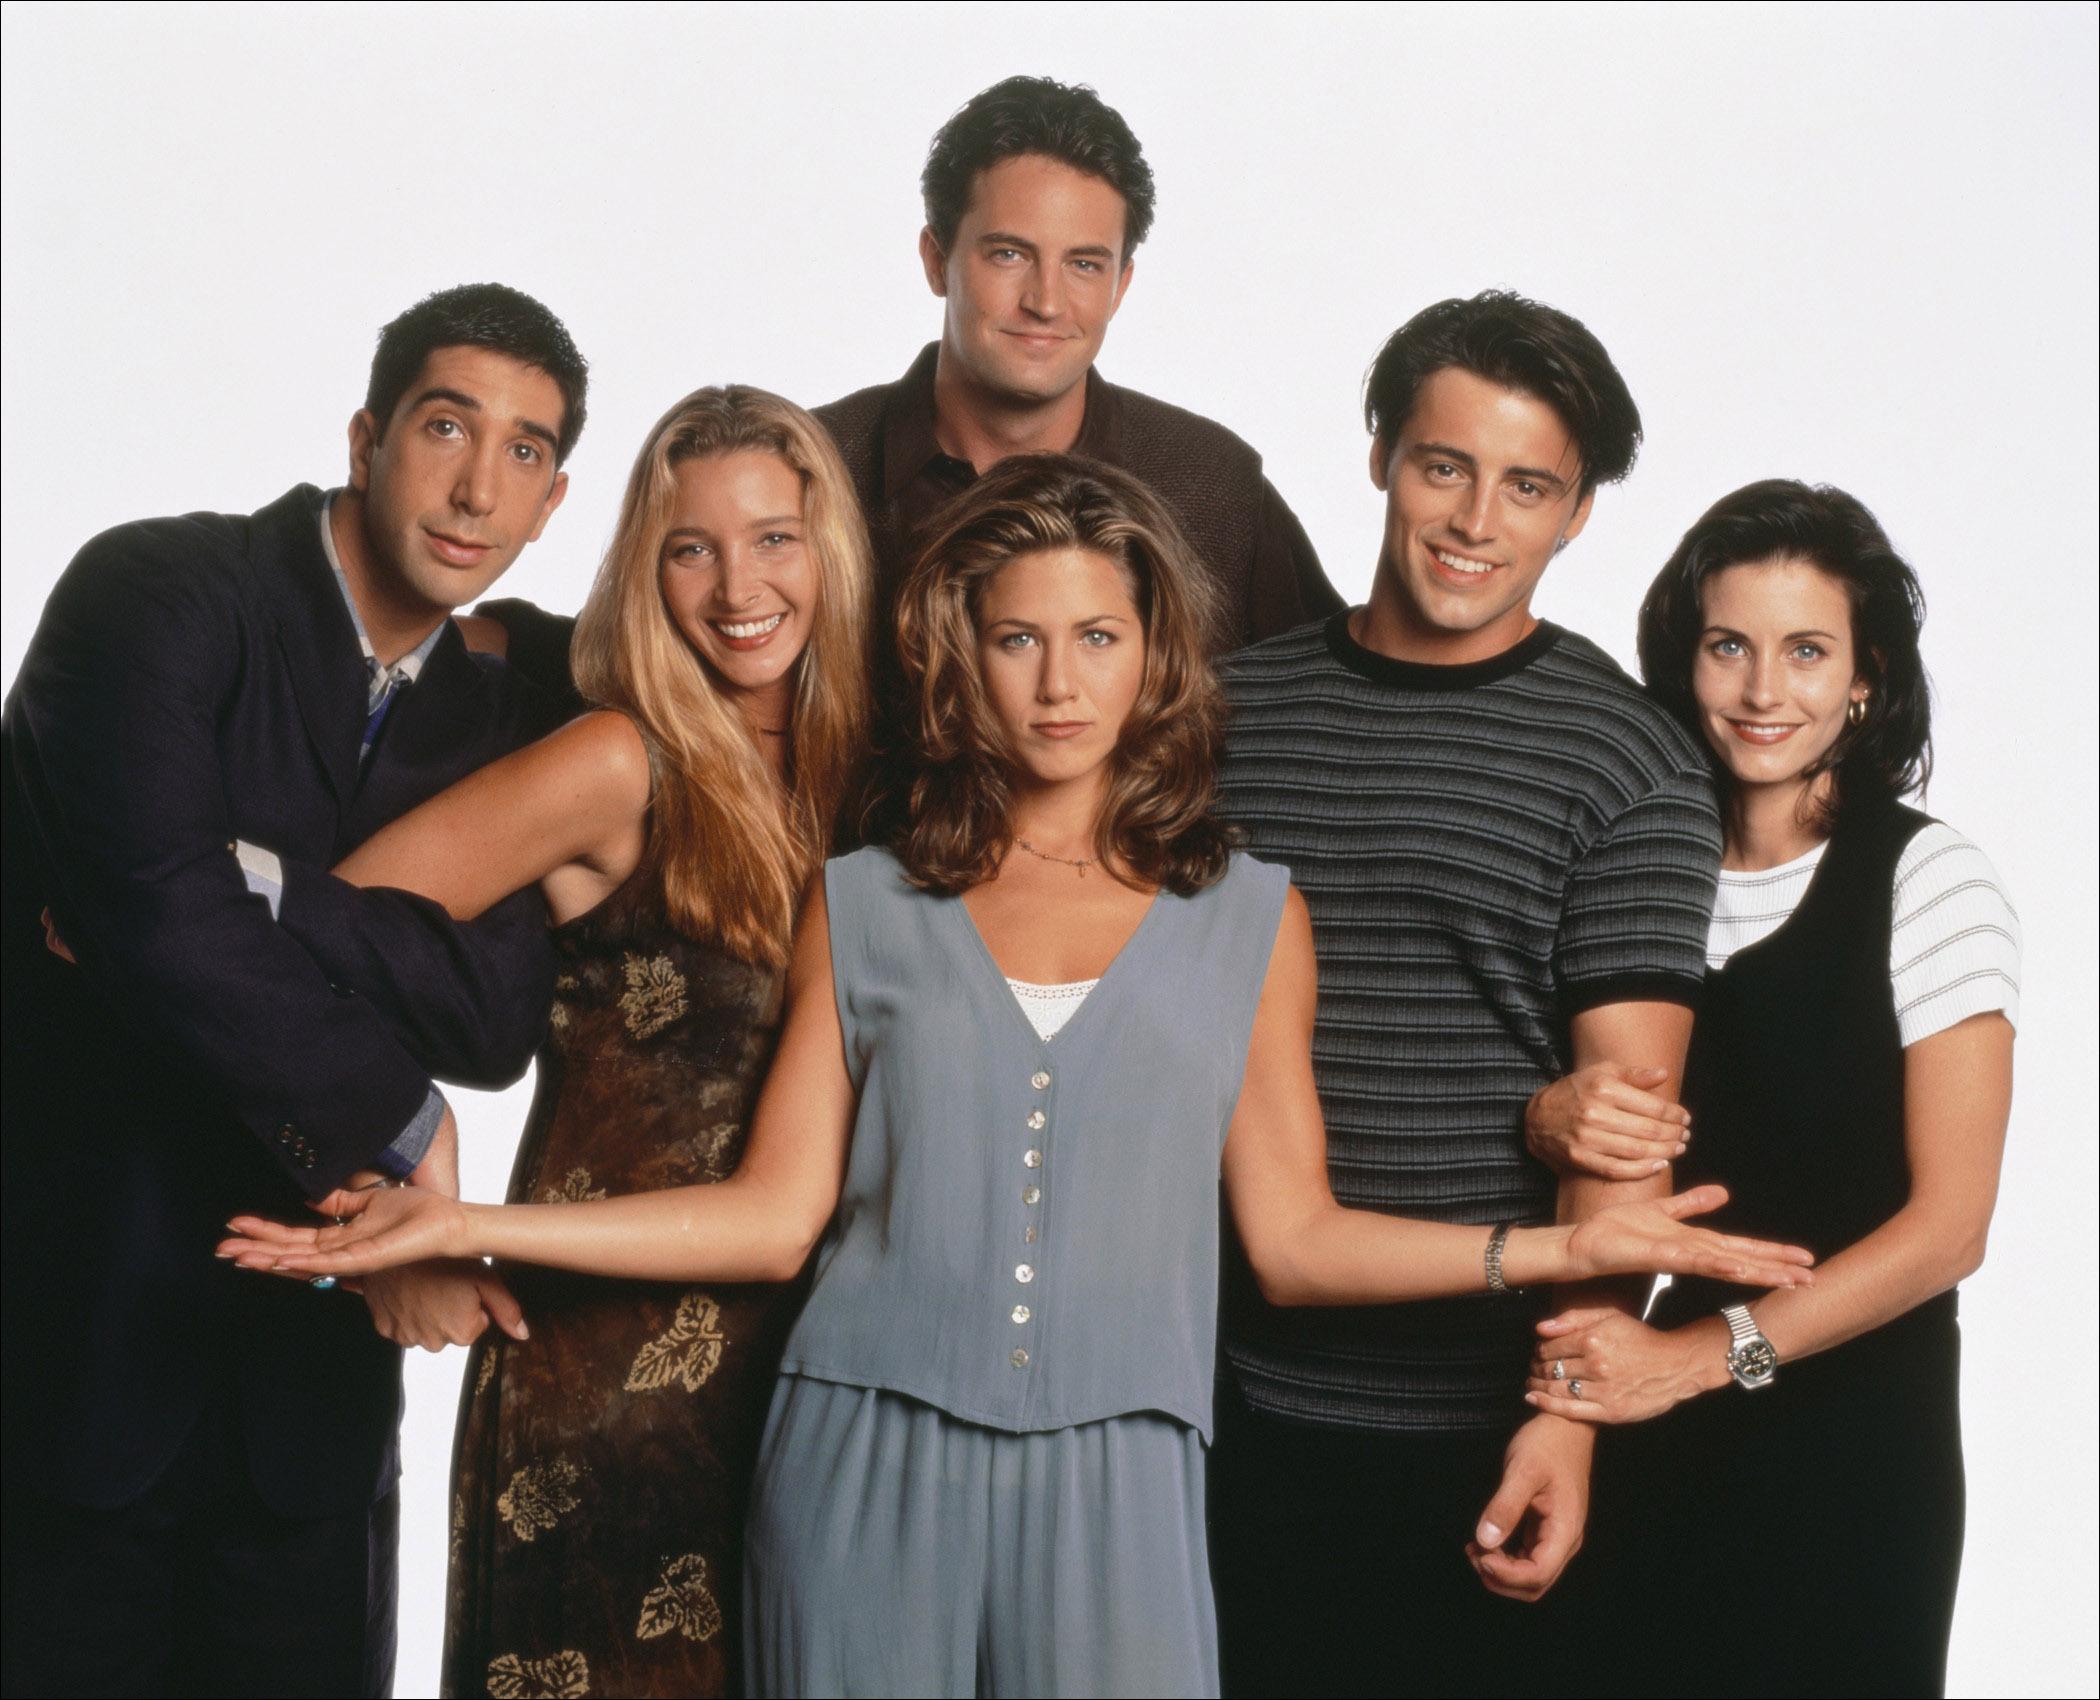 Friends-cast-friends-19956673-2100-1700